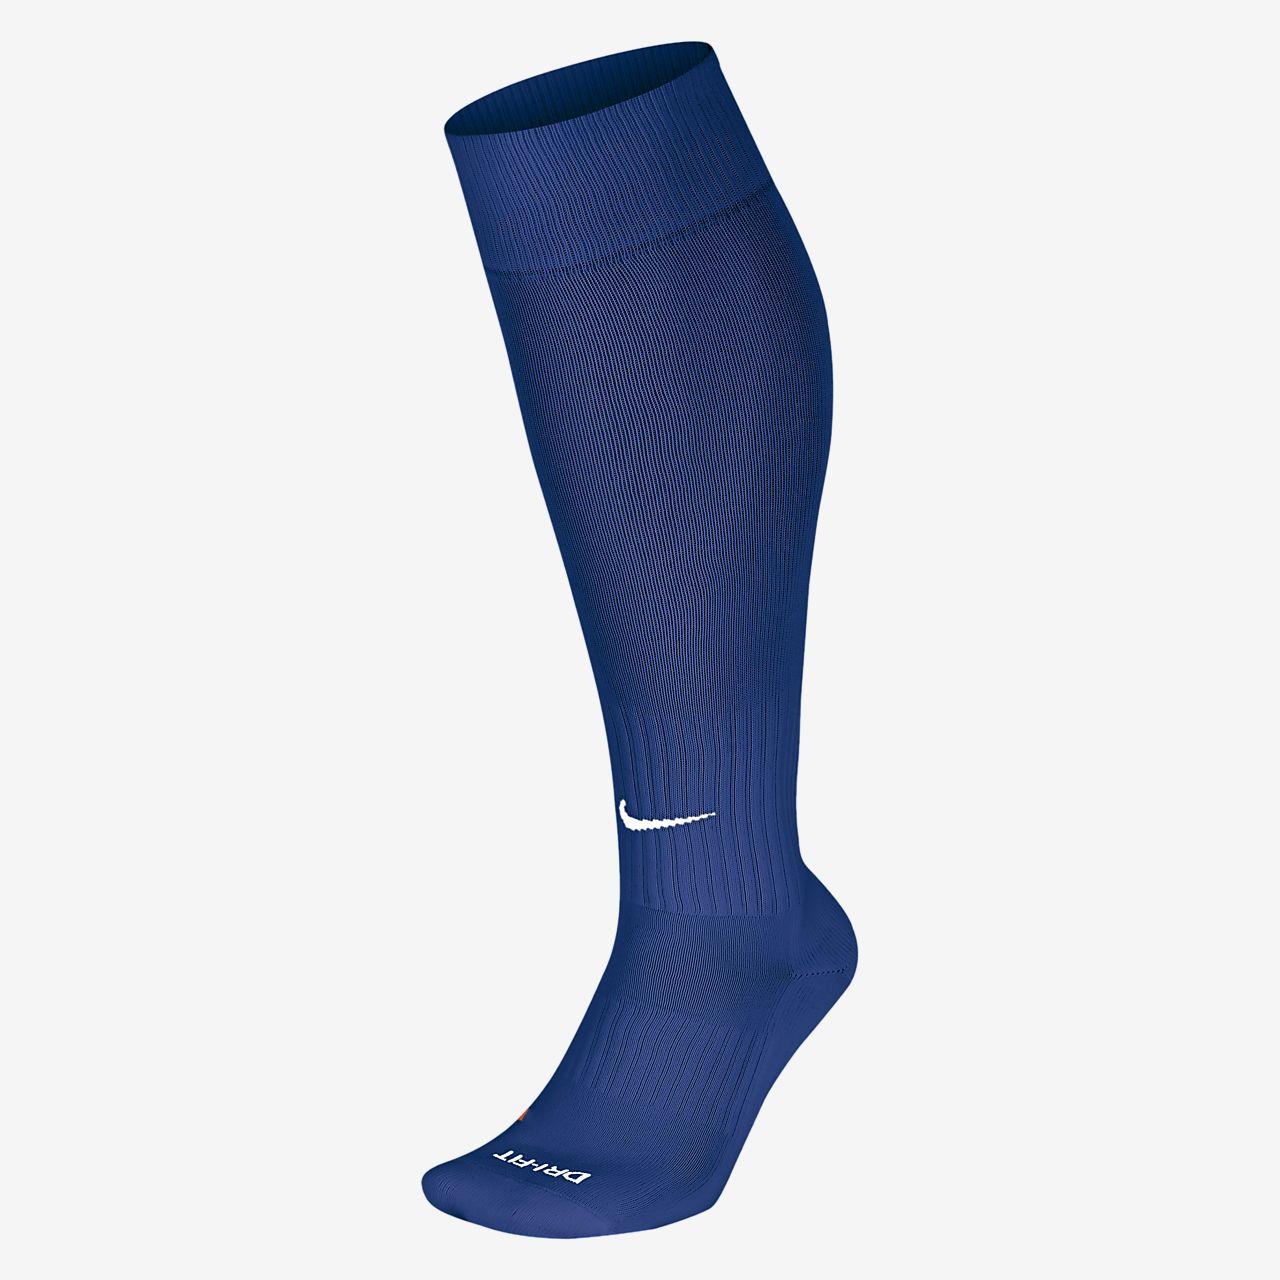 Nike Classic futballzokni